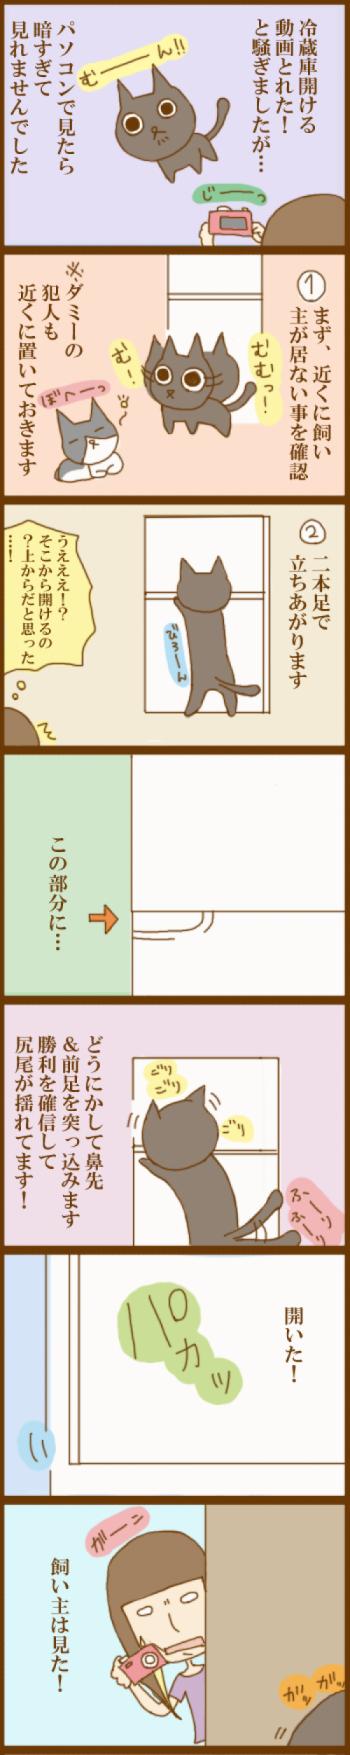 f:id:suzuokayu:20201125102617j:plain